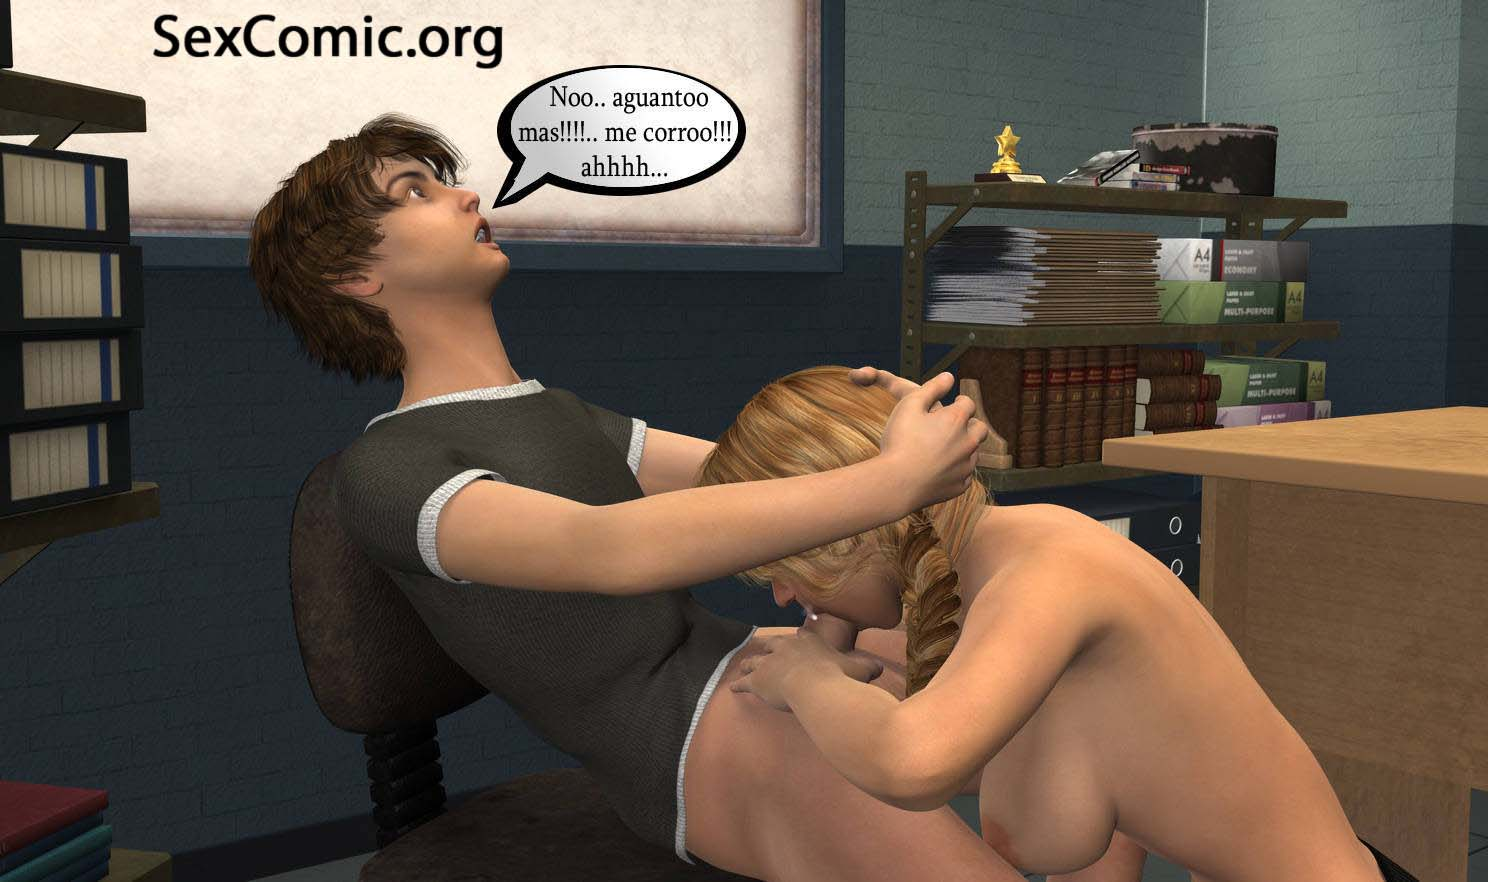 comic-xxx-3d-seduciendo-alas-empleadas-de-mama-historias-sexuales-mangas-para-adultos-videos-deincesto-comics-xxx-historias-eroticas-fantacias-sexuales-gtaris-online-52